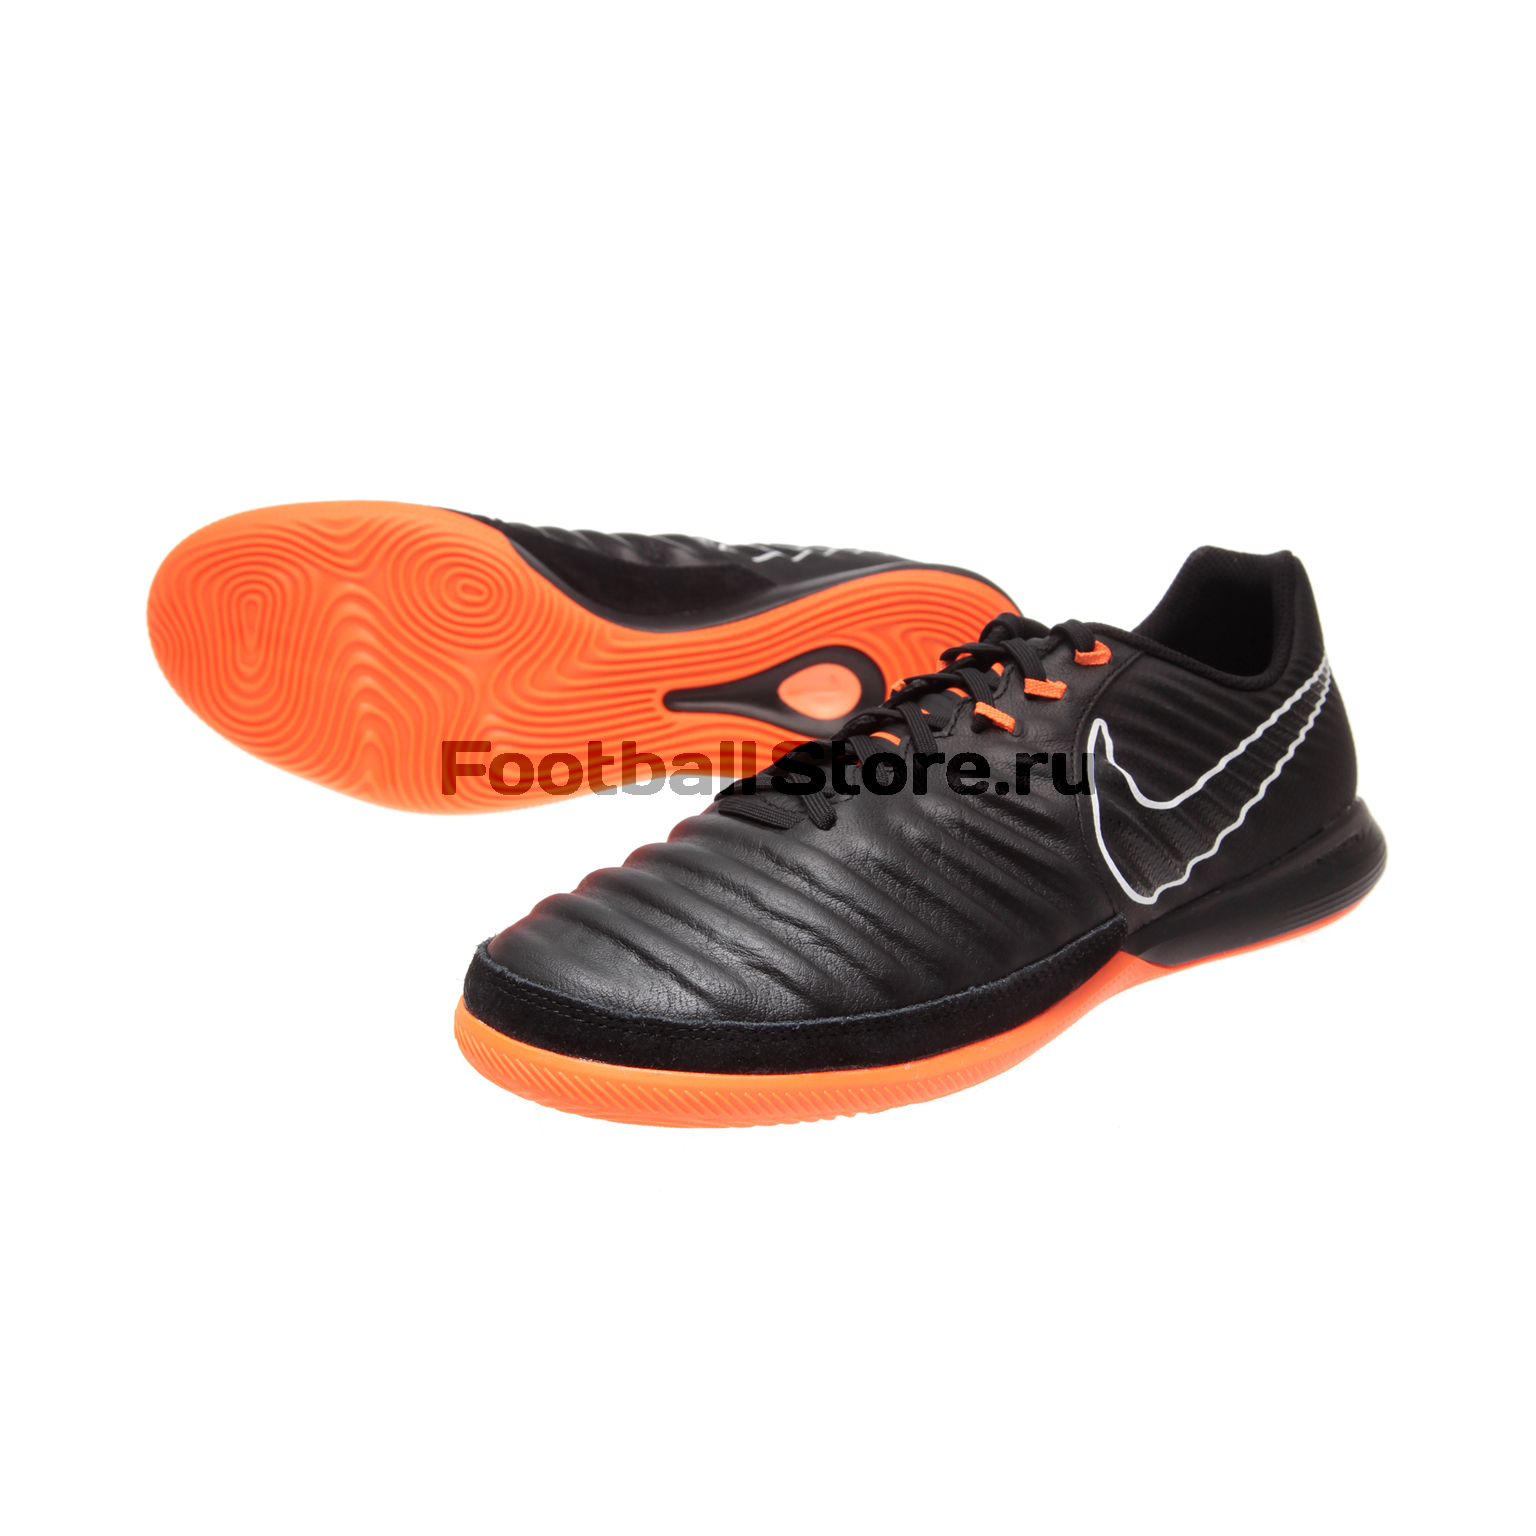 Обувь для зала Nike Lunar LegendX 7 Pro IC AH7246-080 бутсы nike legend 7 elite fg ah7238 080